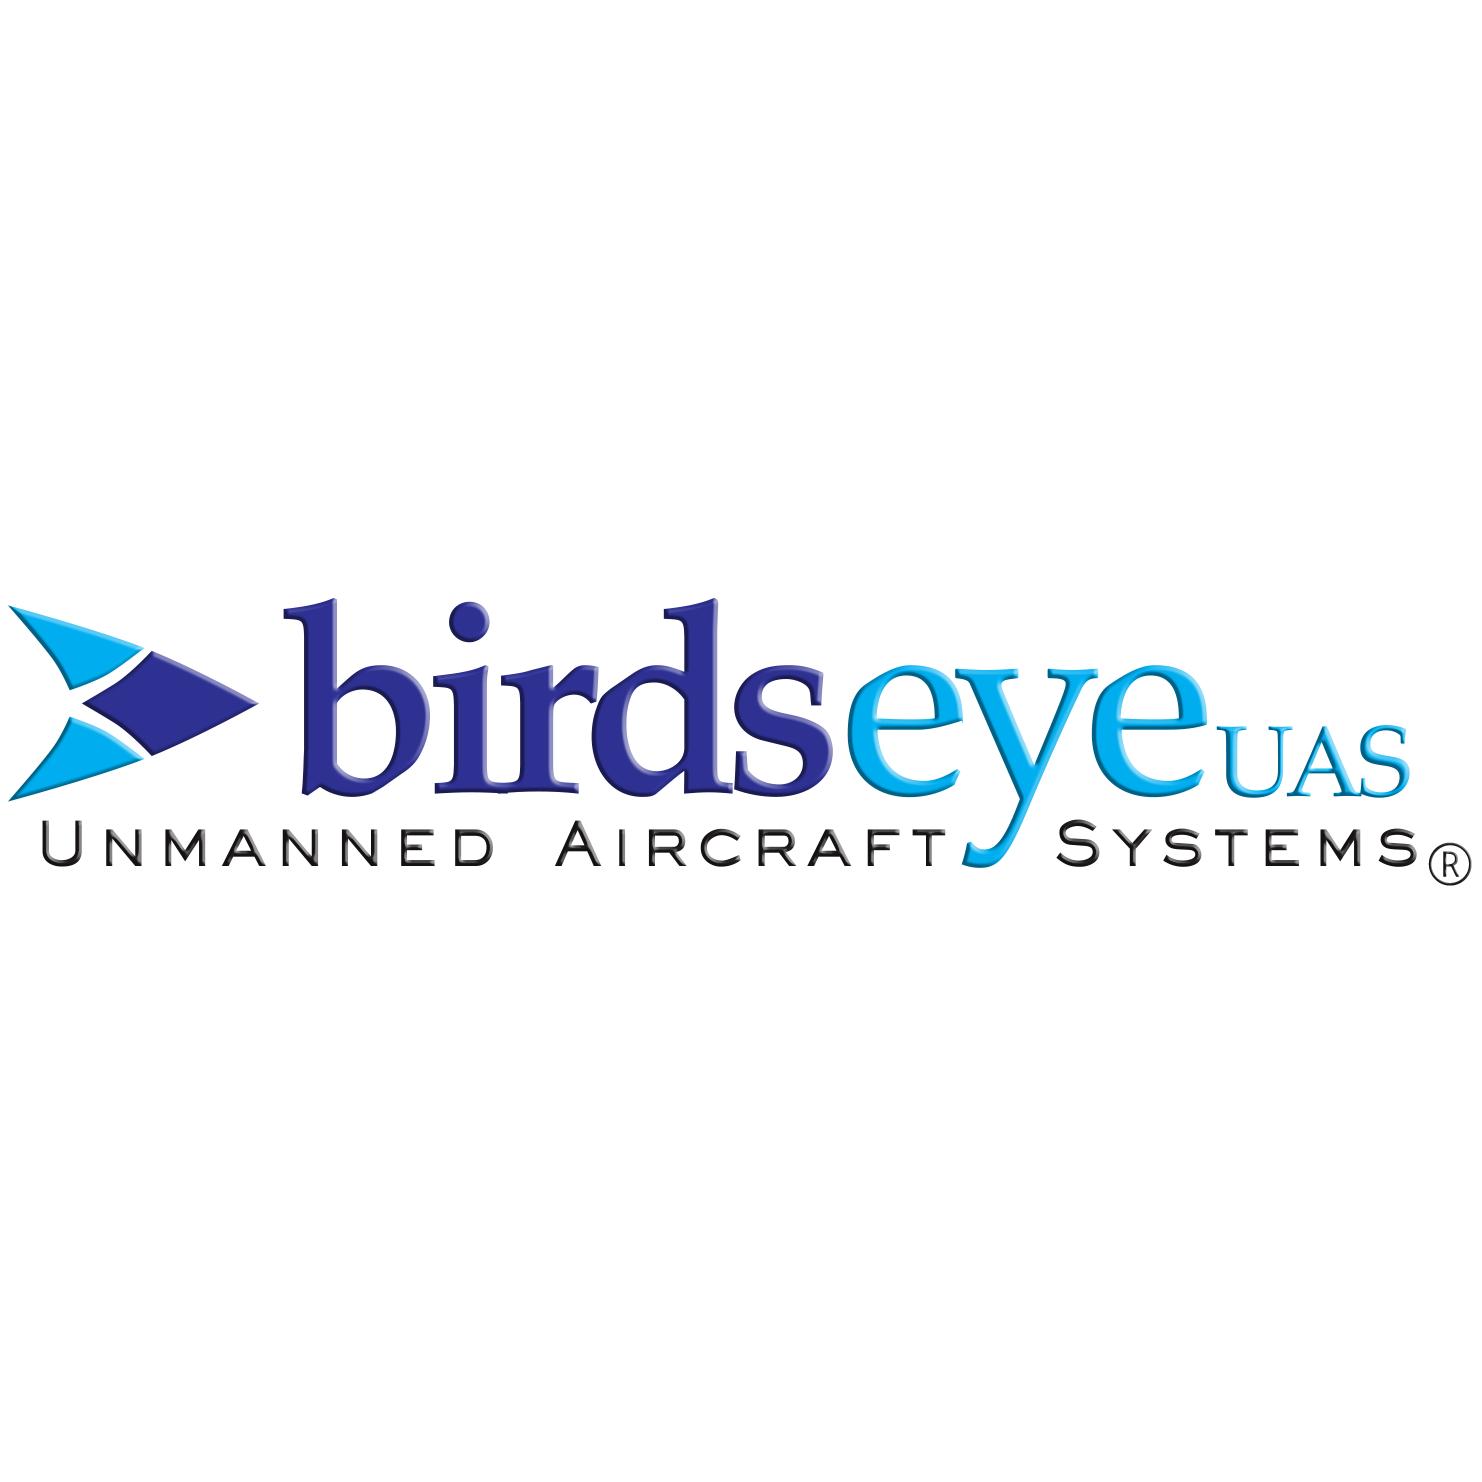 Birds Eye UAS